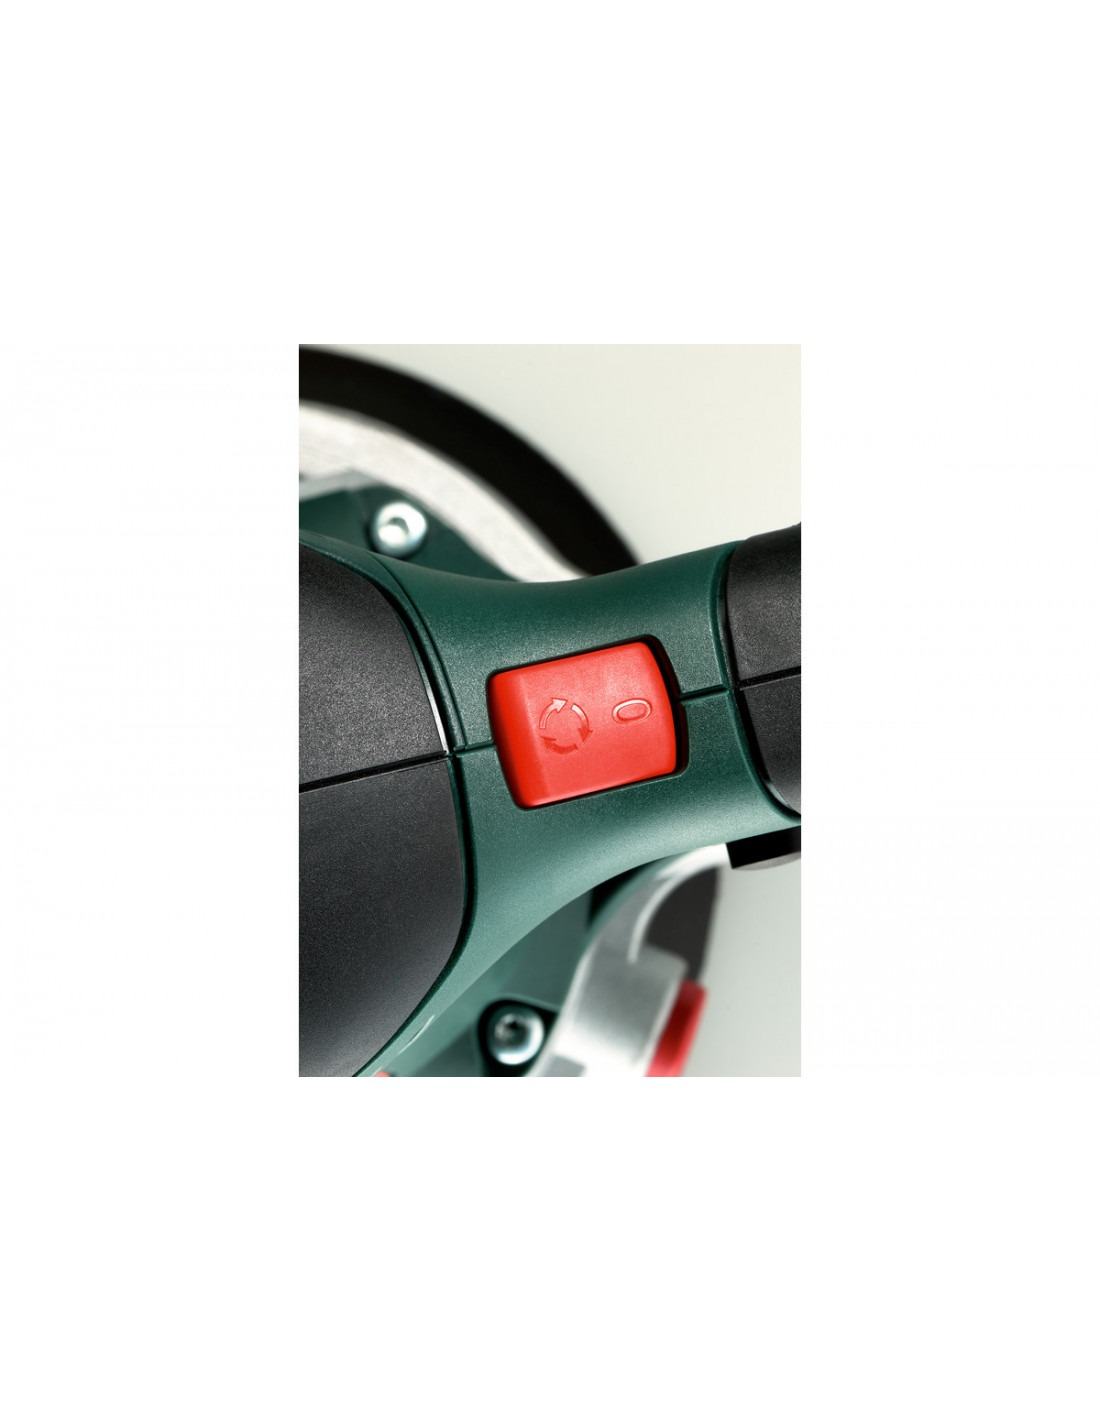 ponceuse excentrique 350w sxe 450 turbotec - 600129000 - metabo pas